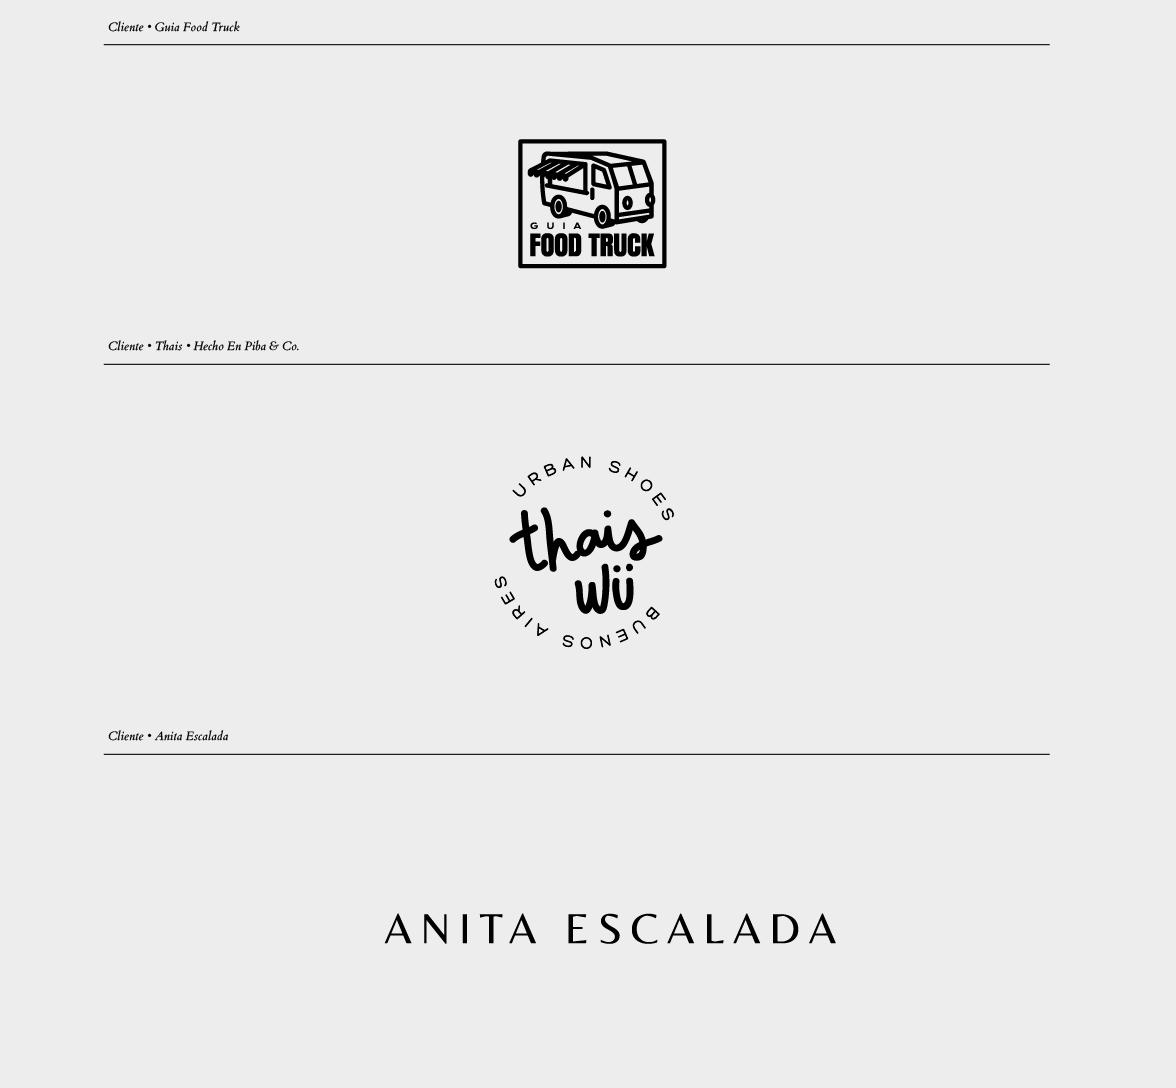 logos-2-v3-03